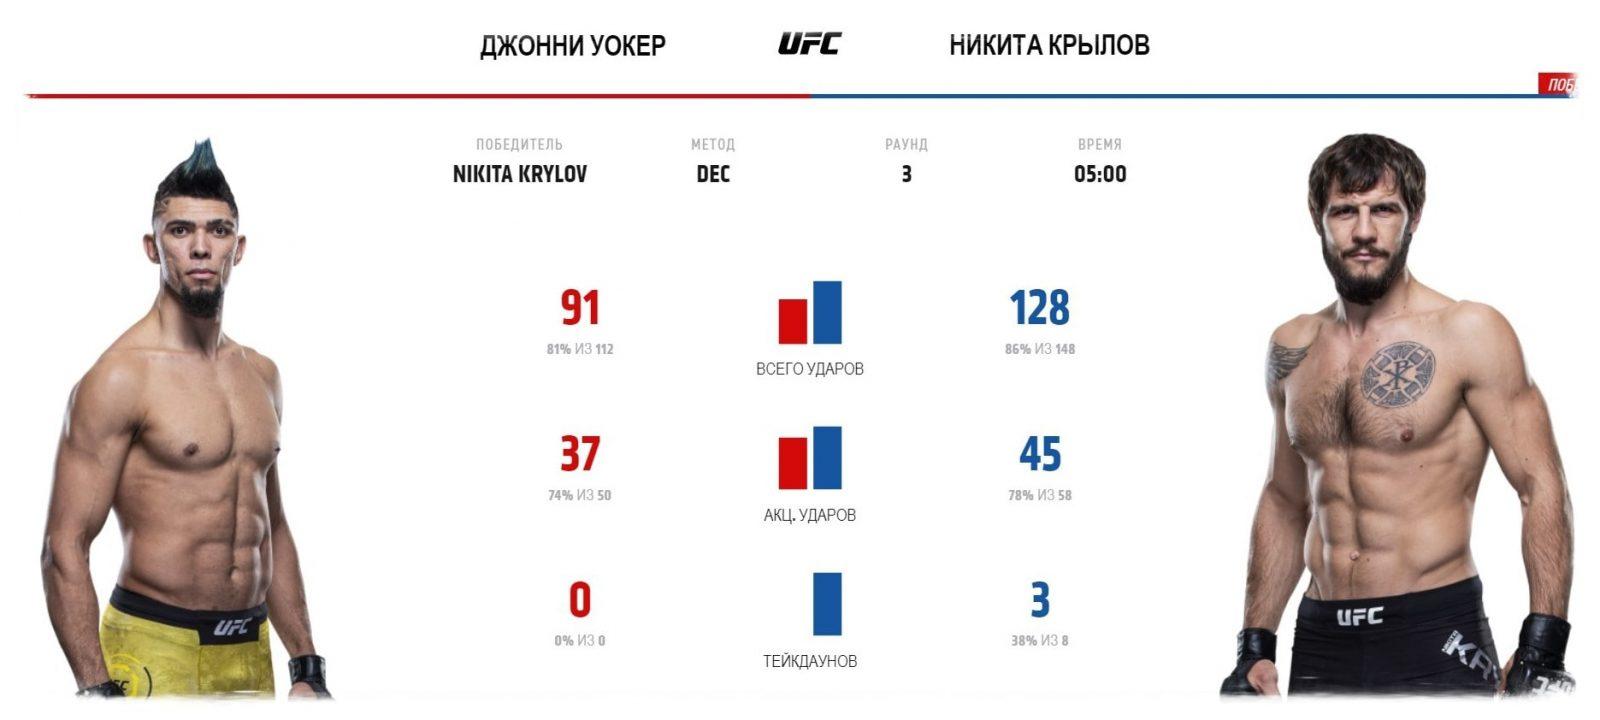 video-boya-dzhonni-uoker-nikita-krylov-johnny-walker-nikita-krylov-ufc-fight-night-170